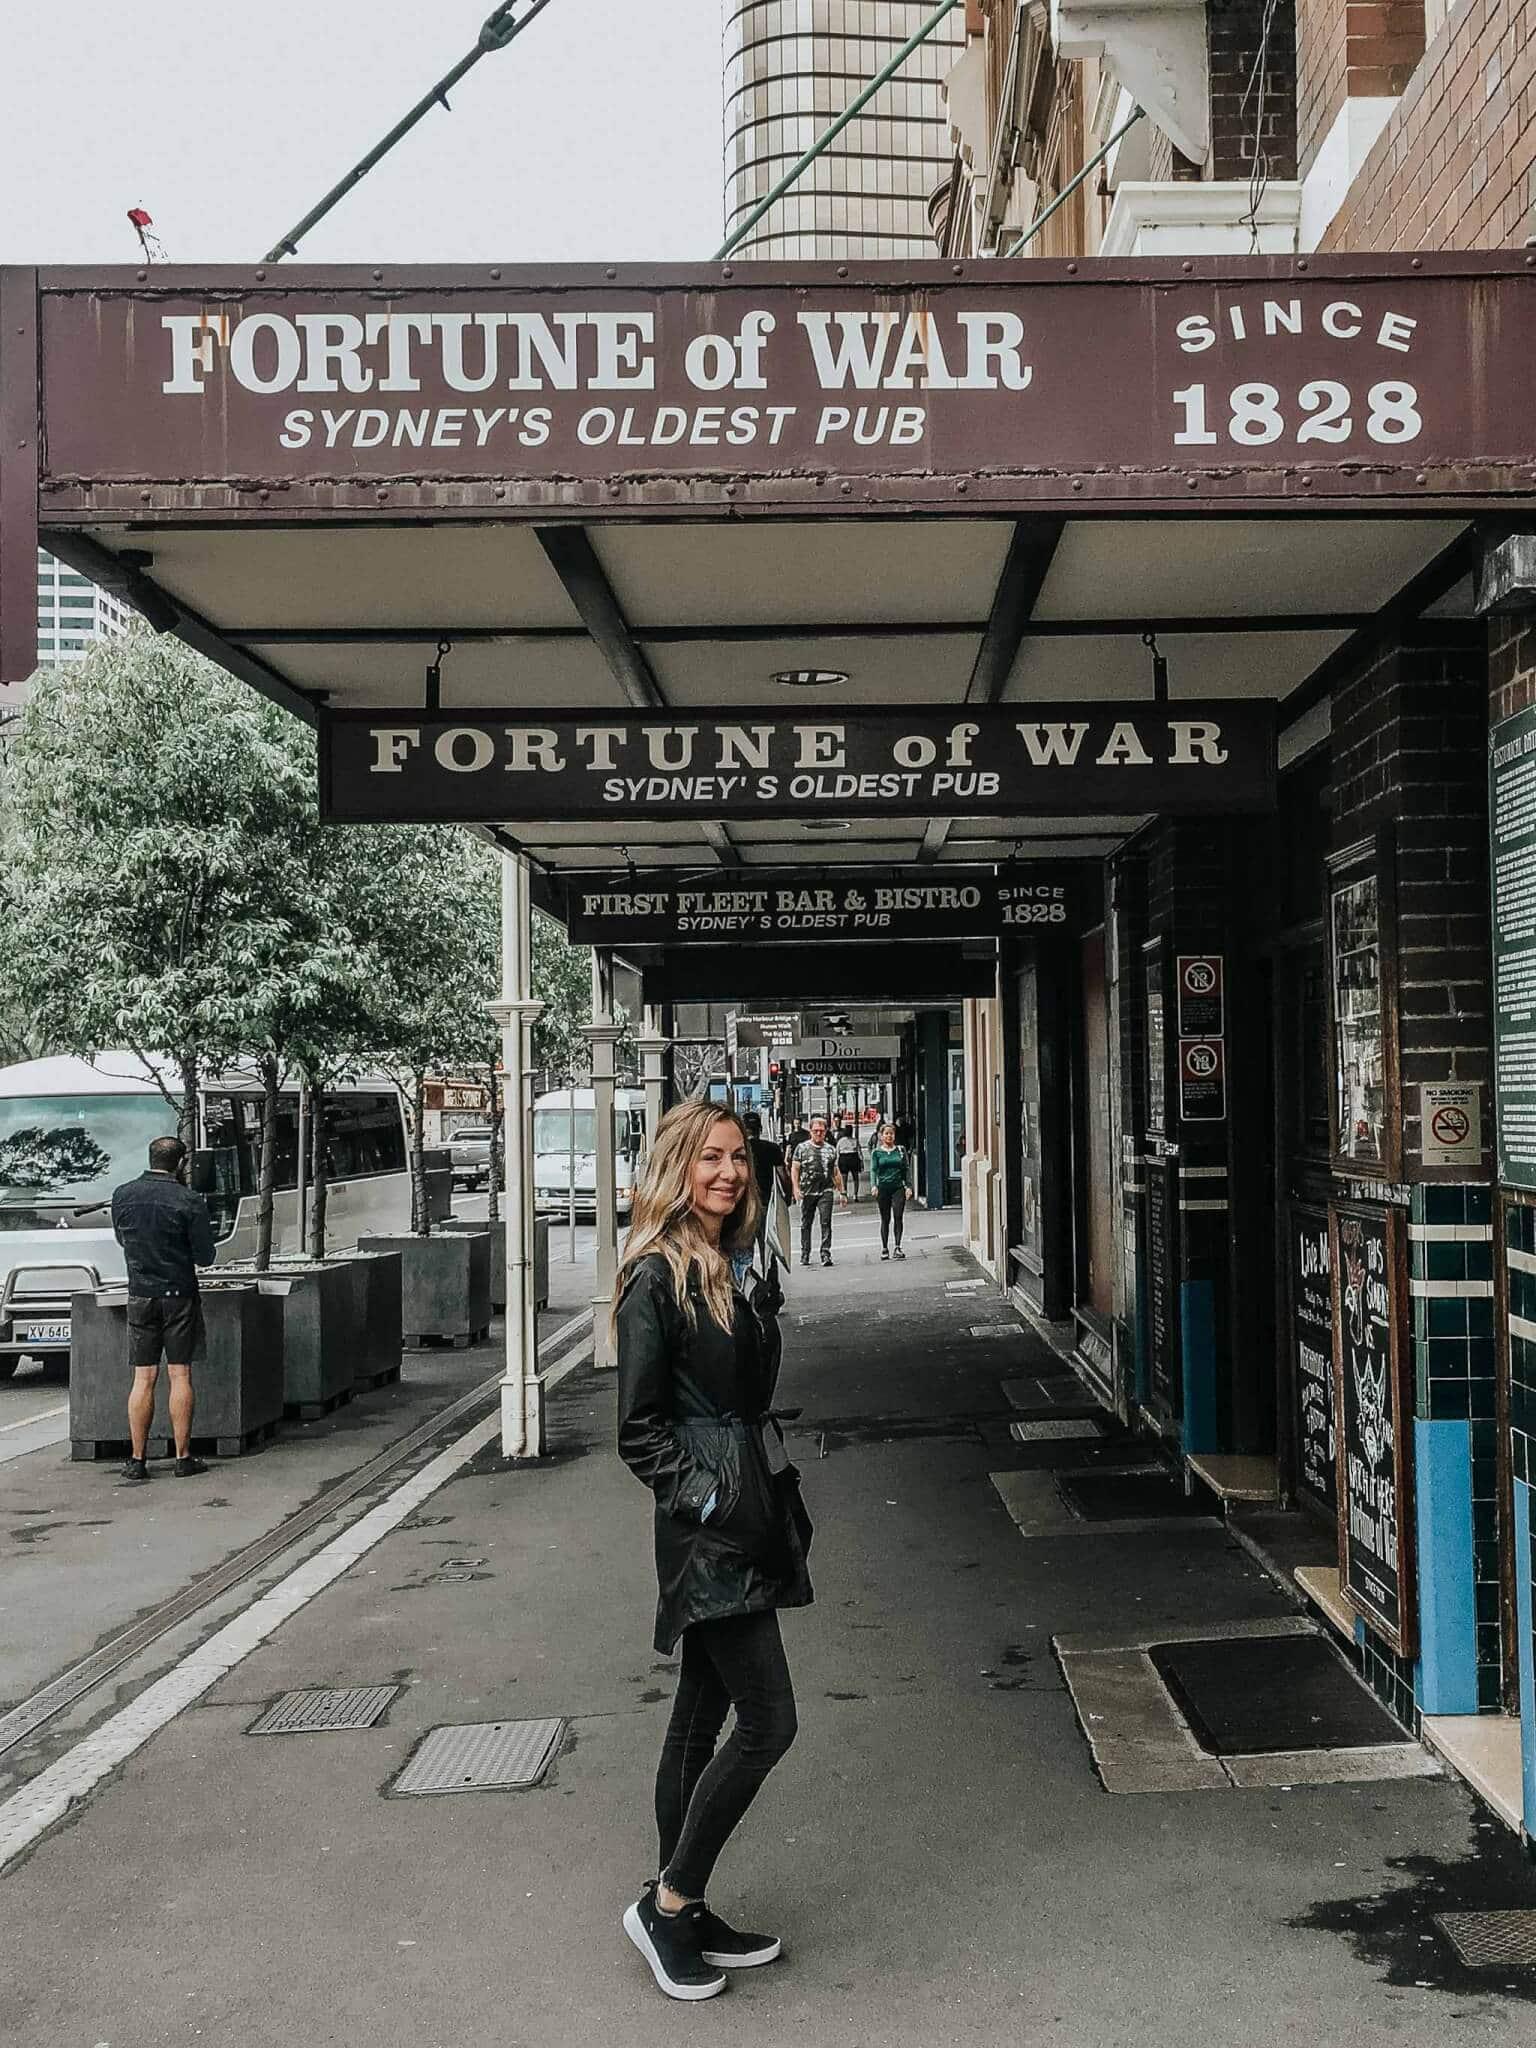 oldest pub in sydney australia